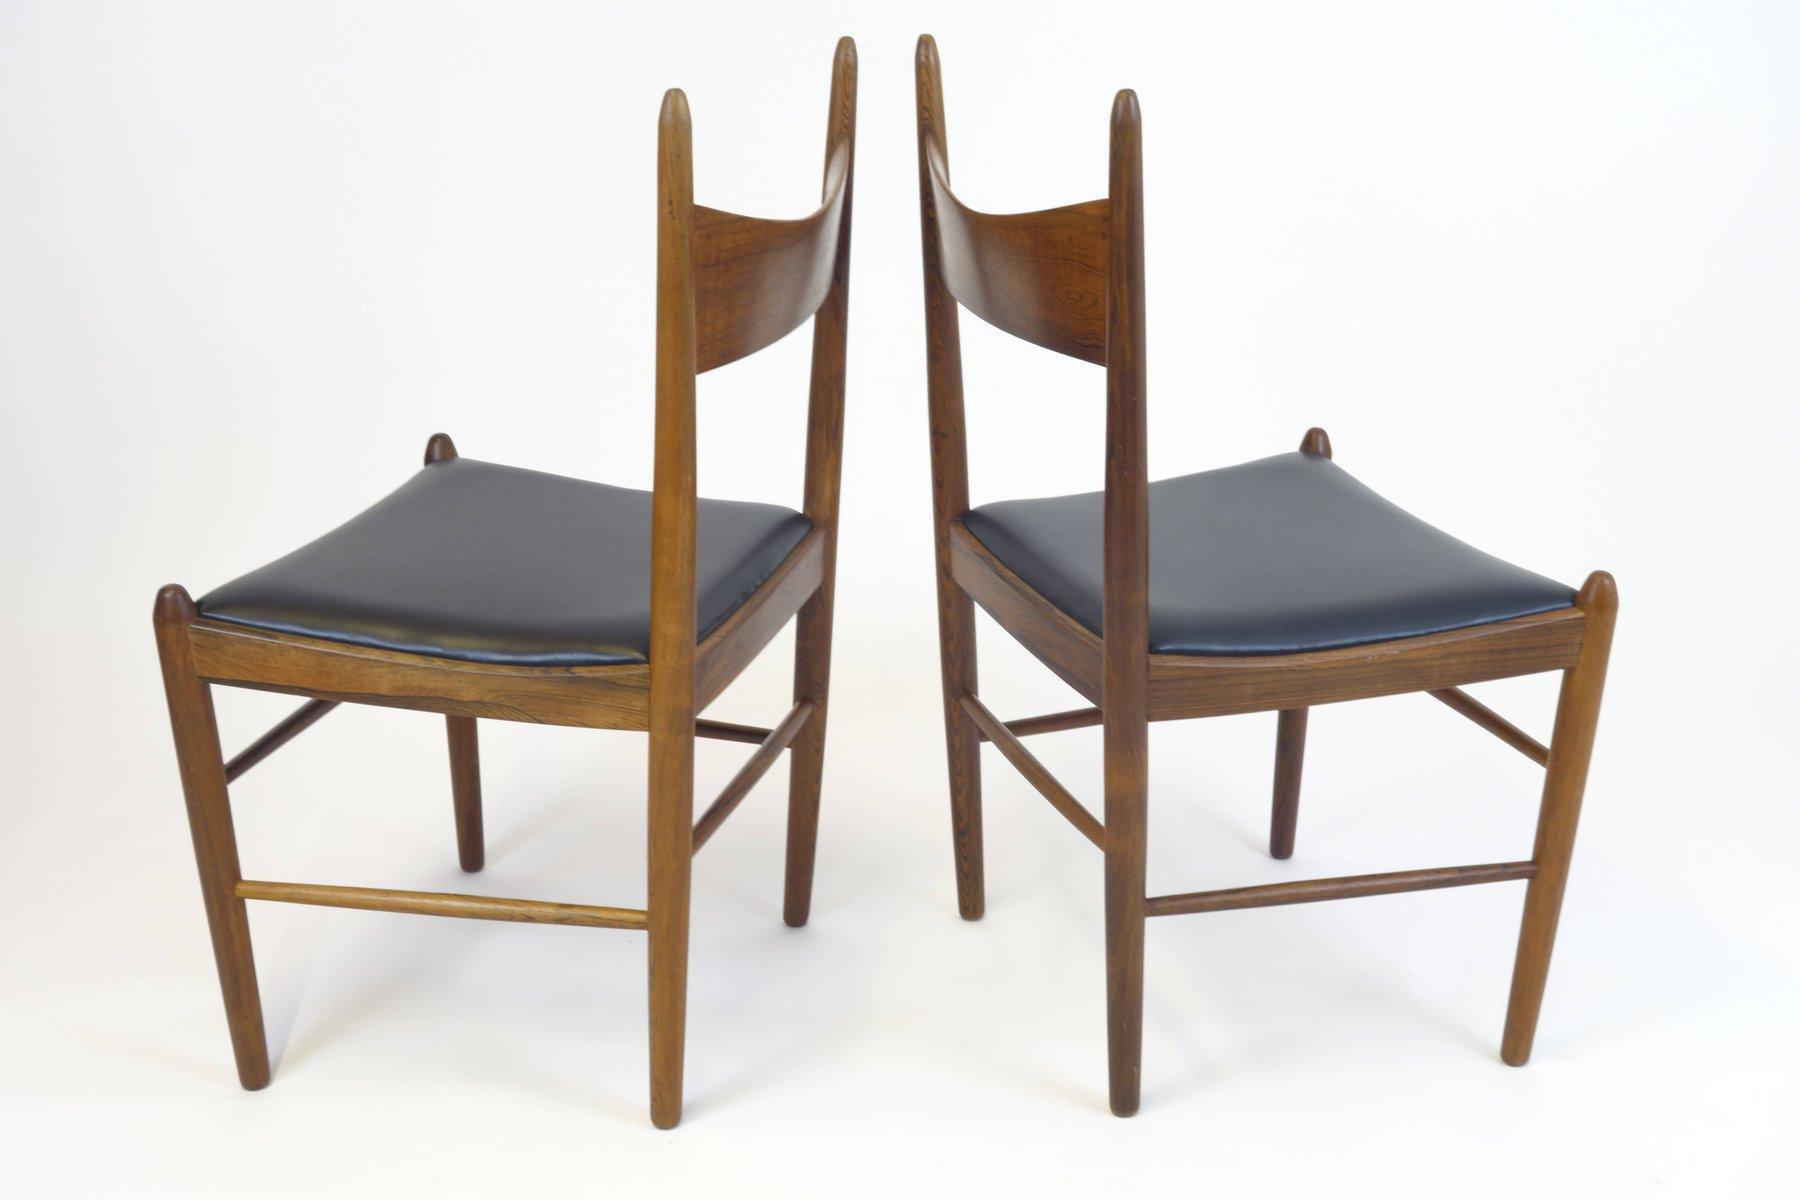 esszimmerst hle von illum wikkelso f r vestervig eriksen 1960er 4er set bei pamono kaufen. Black Bedroom Furniture Sets. Home Design Ideas